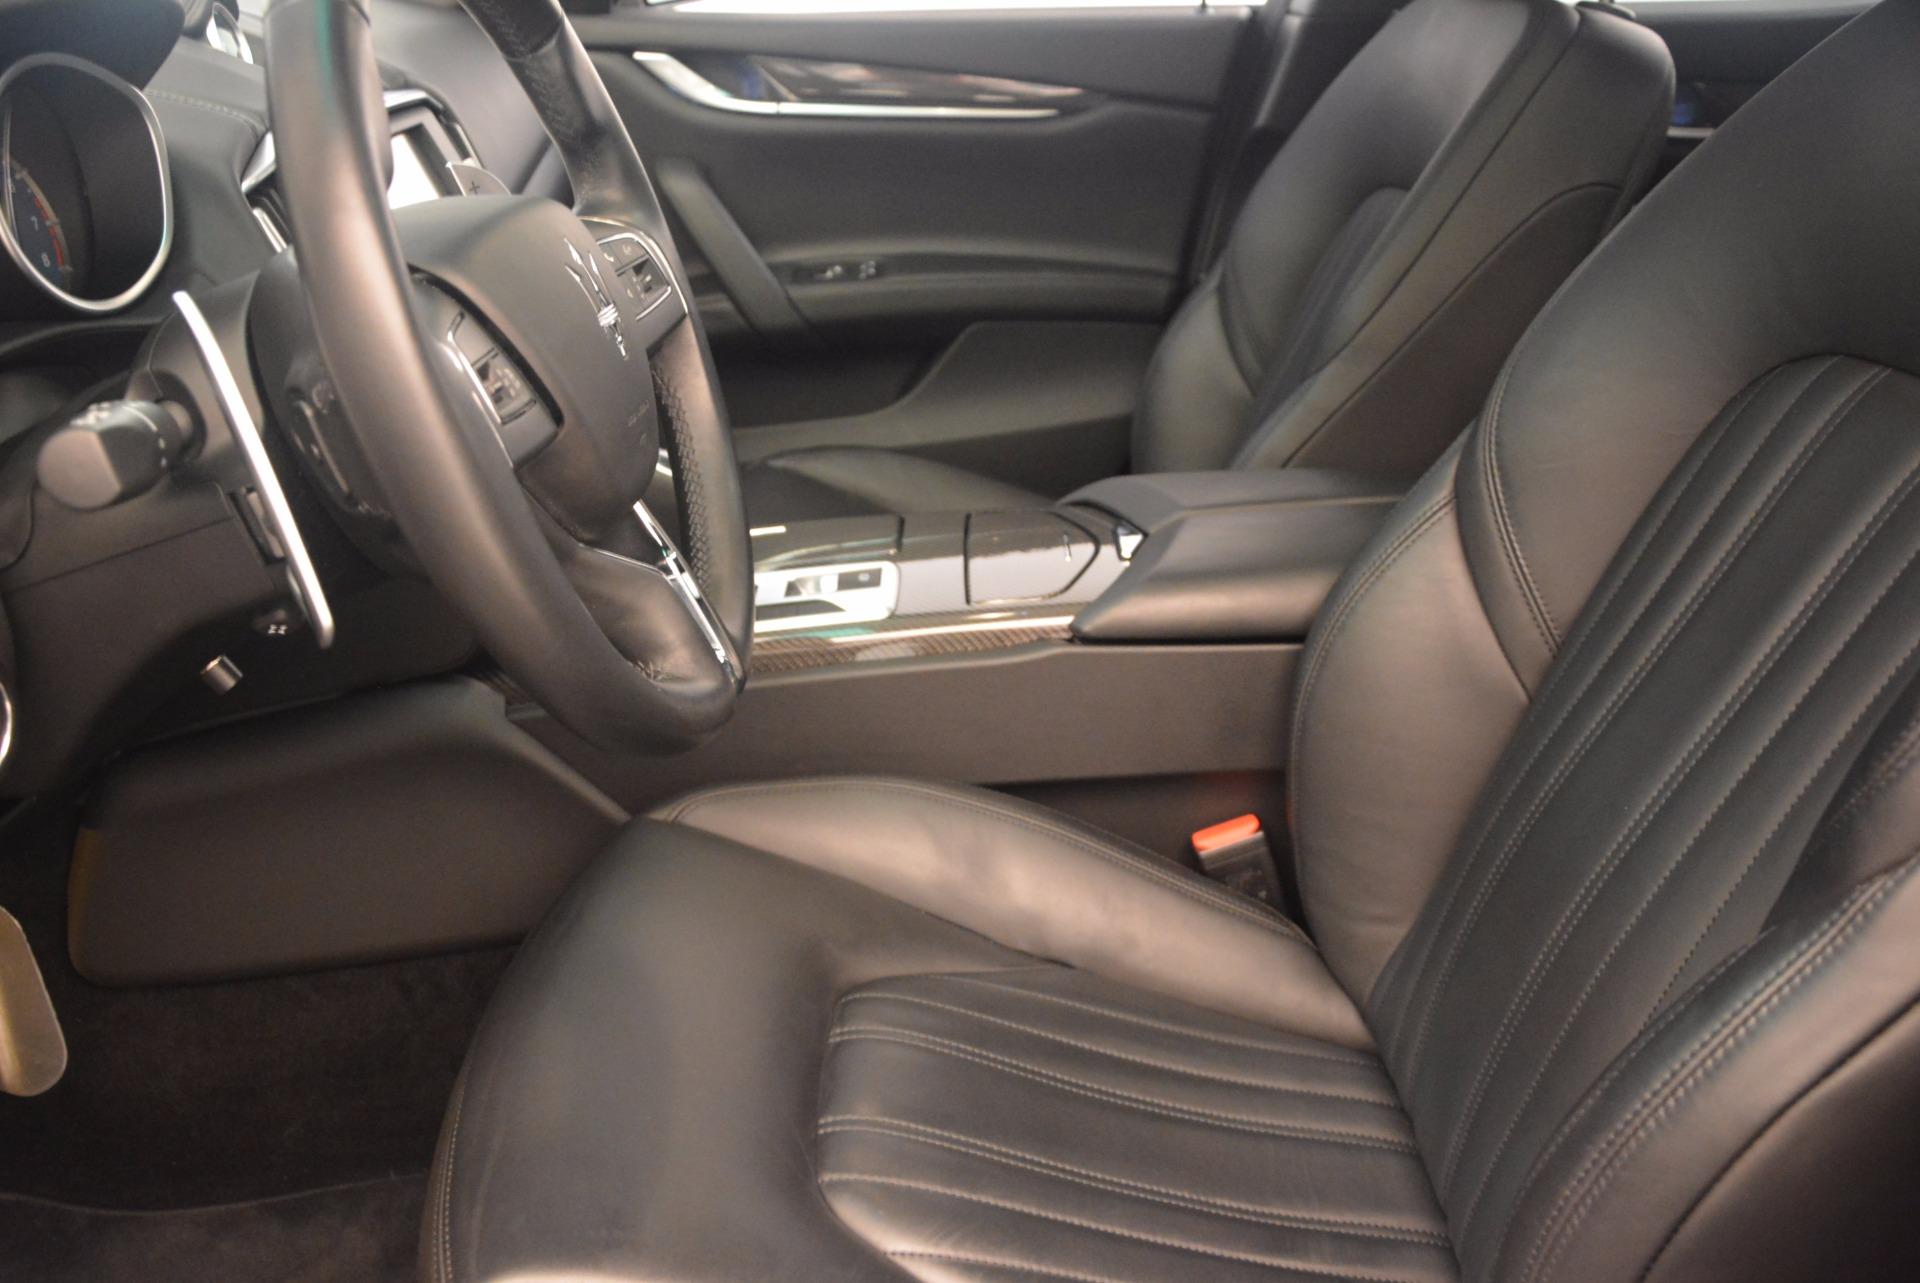 Used 2014 Maserati Ghibli S Q4 For Sale In Greenwich, CT. Alfa Romeo of Greenwich, 7203 1158_p14